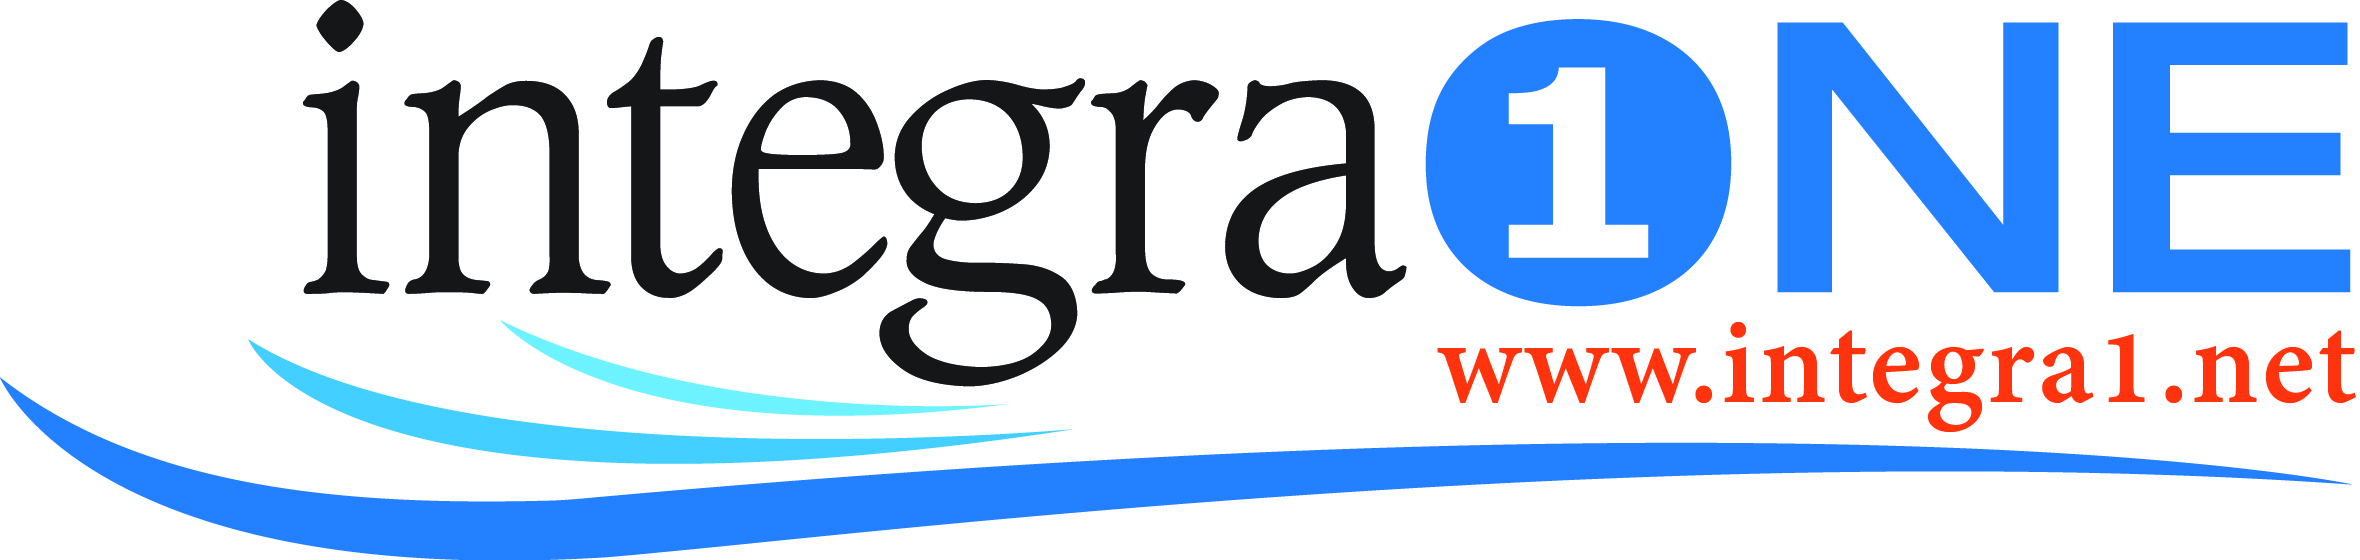 2014-integraone-website-logo